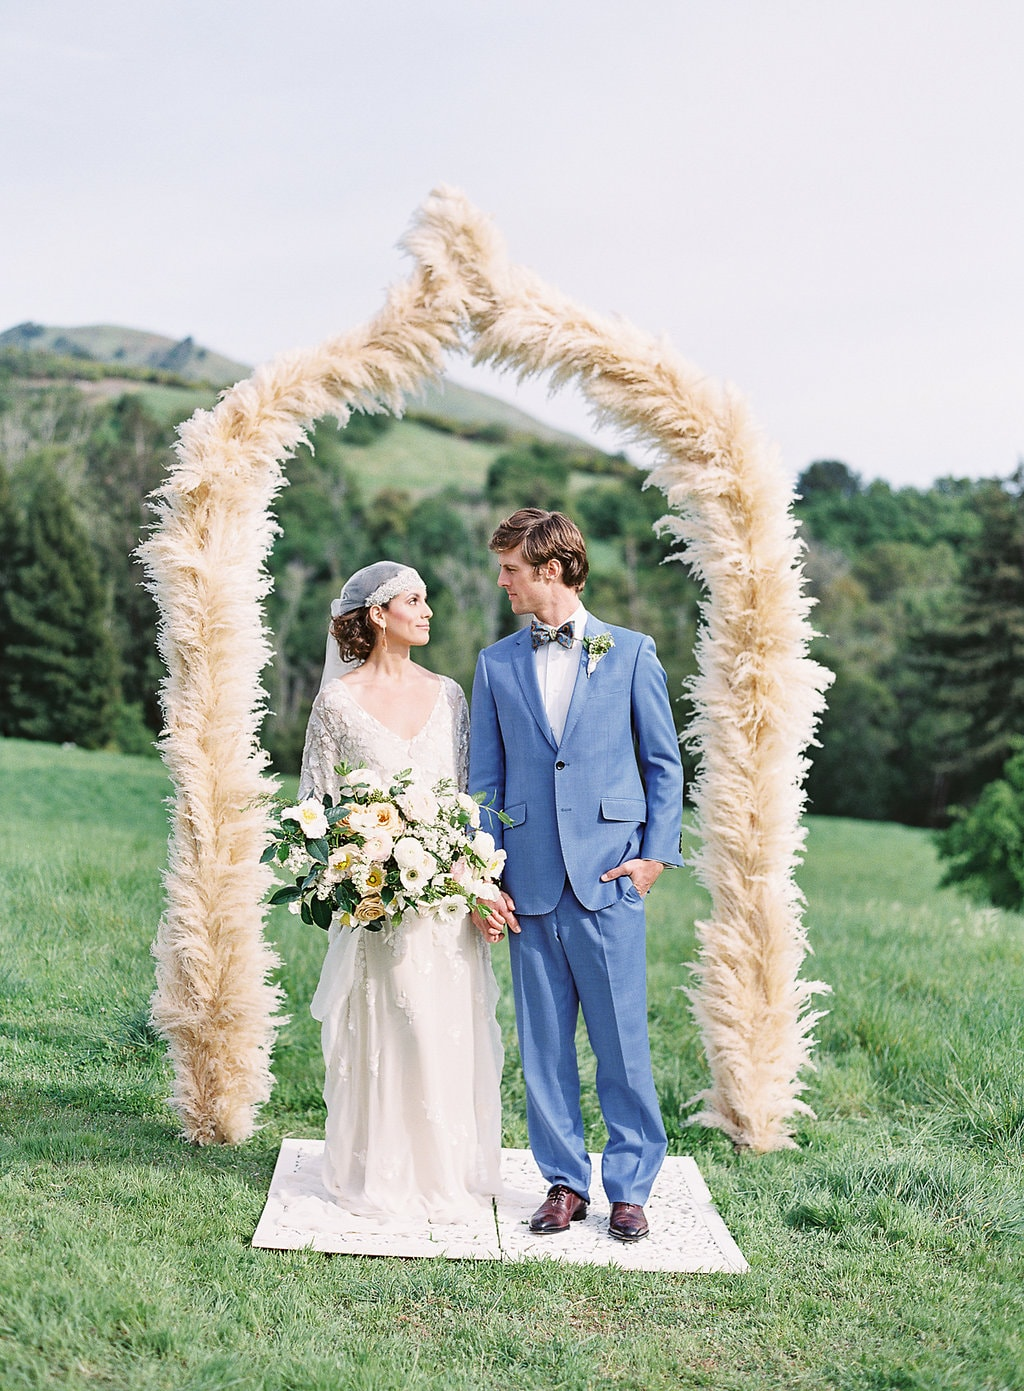 25 Irresistible Pampas Grass Wedding Ideas - https://ruffledblog.com/25-irresistible-pampas-grass-wedding-ideas